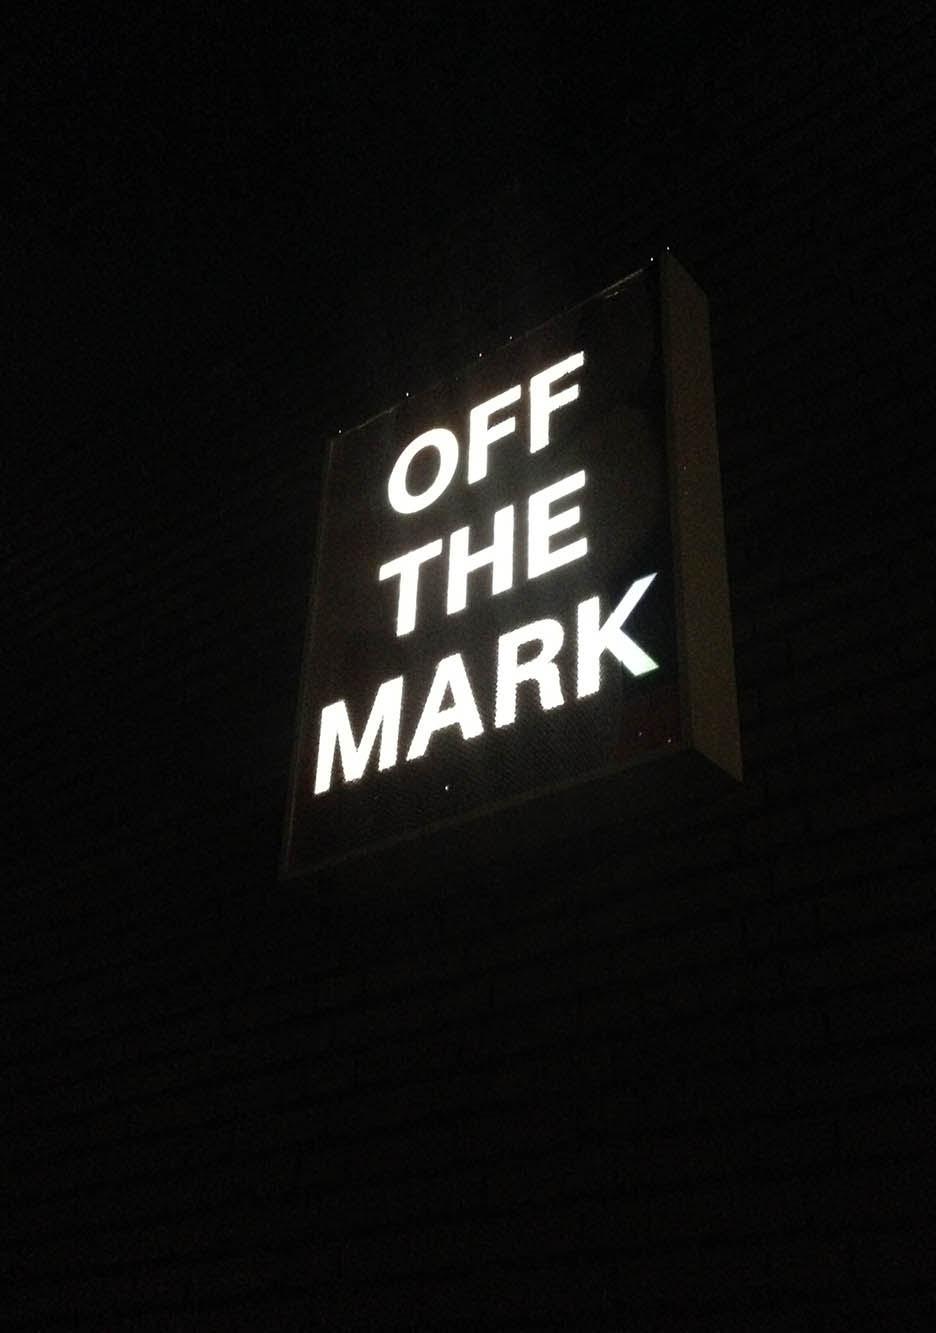 off_the_mark_night